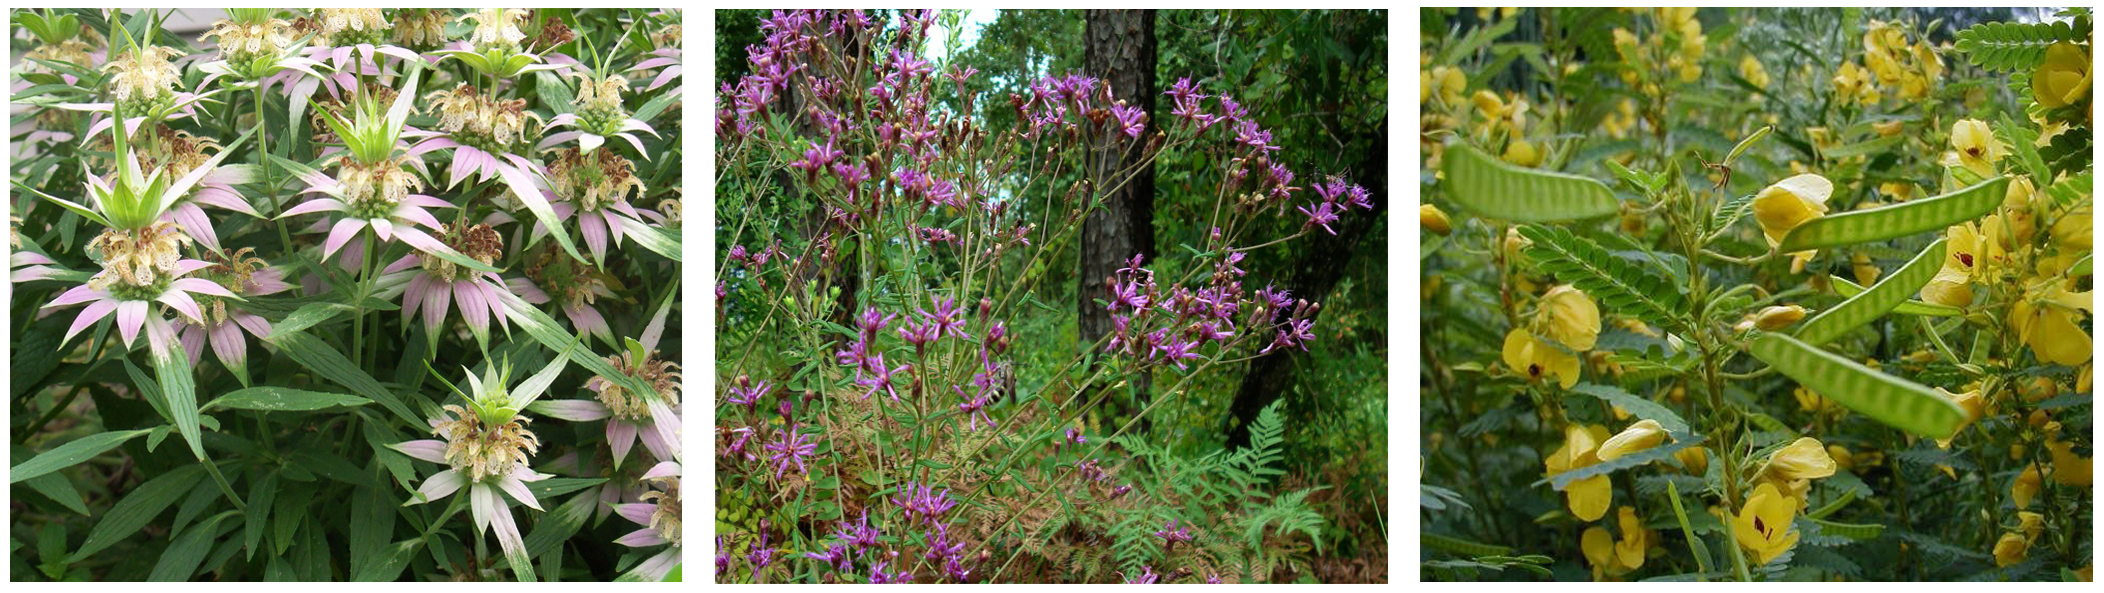 media/seed-library-florida-native-wildflowers-beebalm-ironweed-partridgepea.jpg